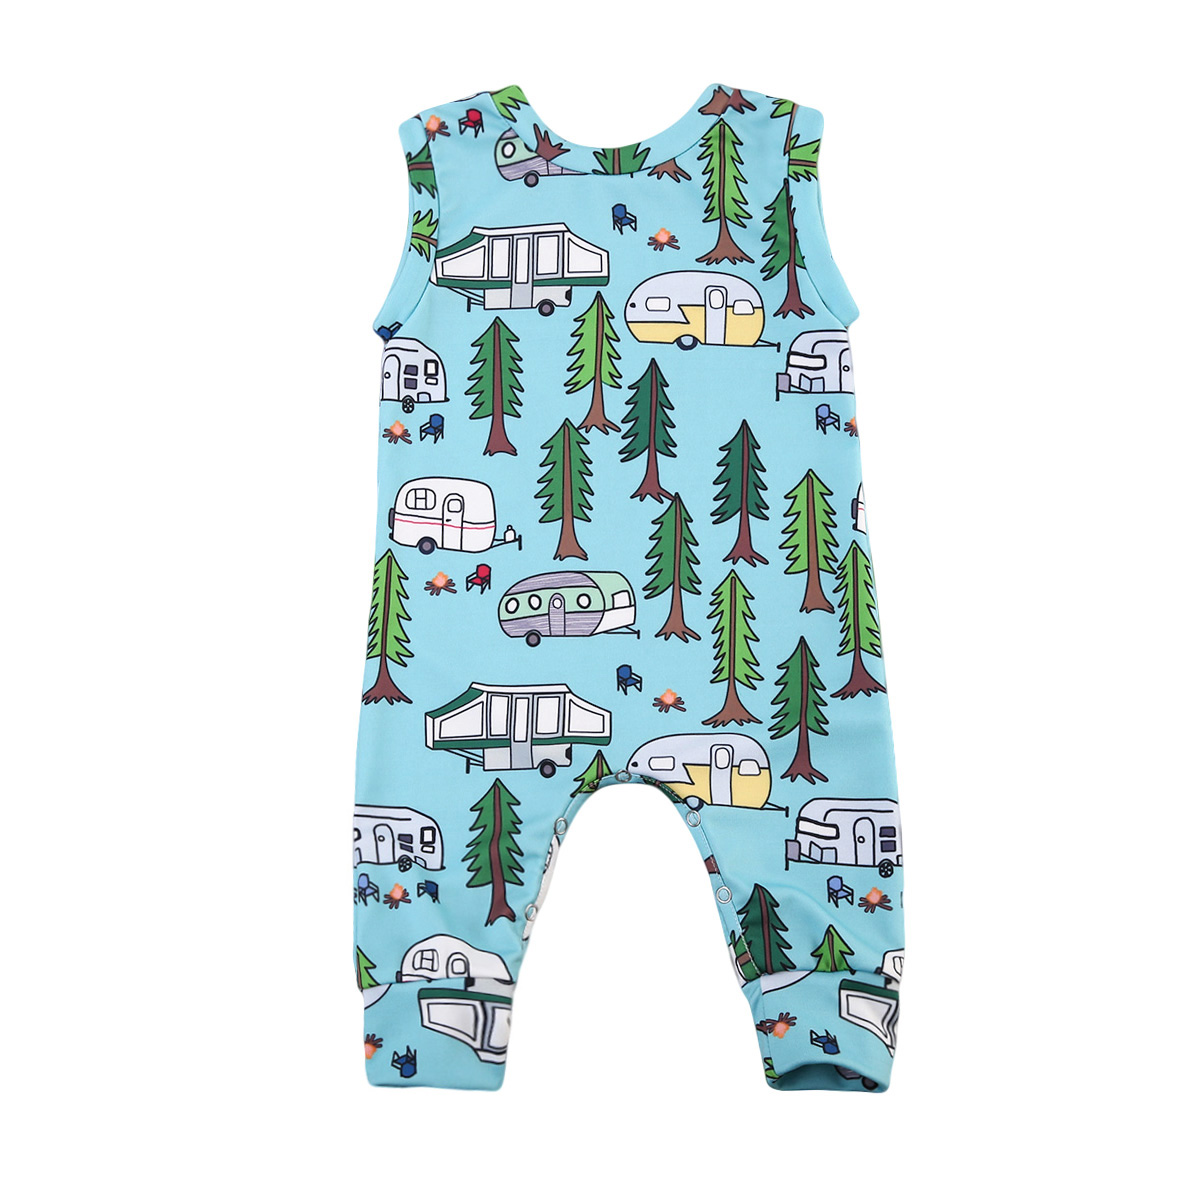 2017 Blau Neugeborene Jungen Mädchen Dinosaurier Sleeveless Spielanzug Gesamt Overall Outfits Anime Nette Kleidung Overalls